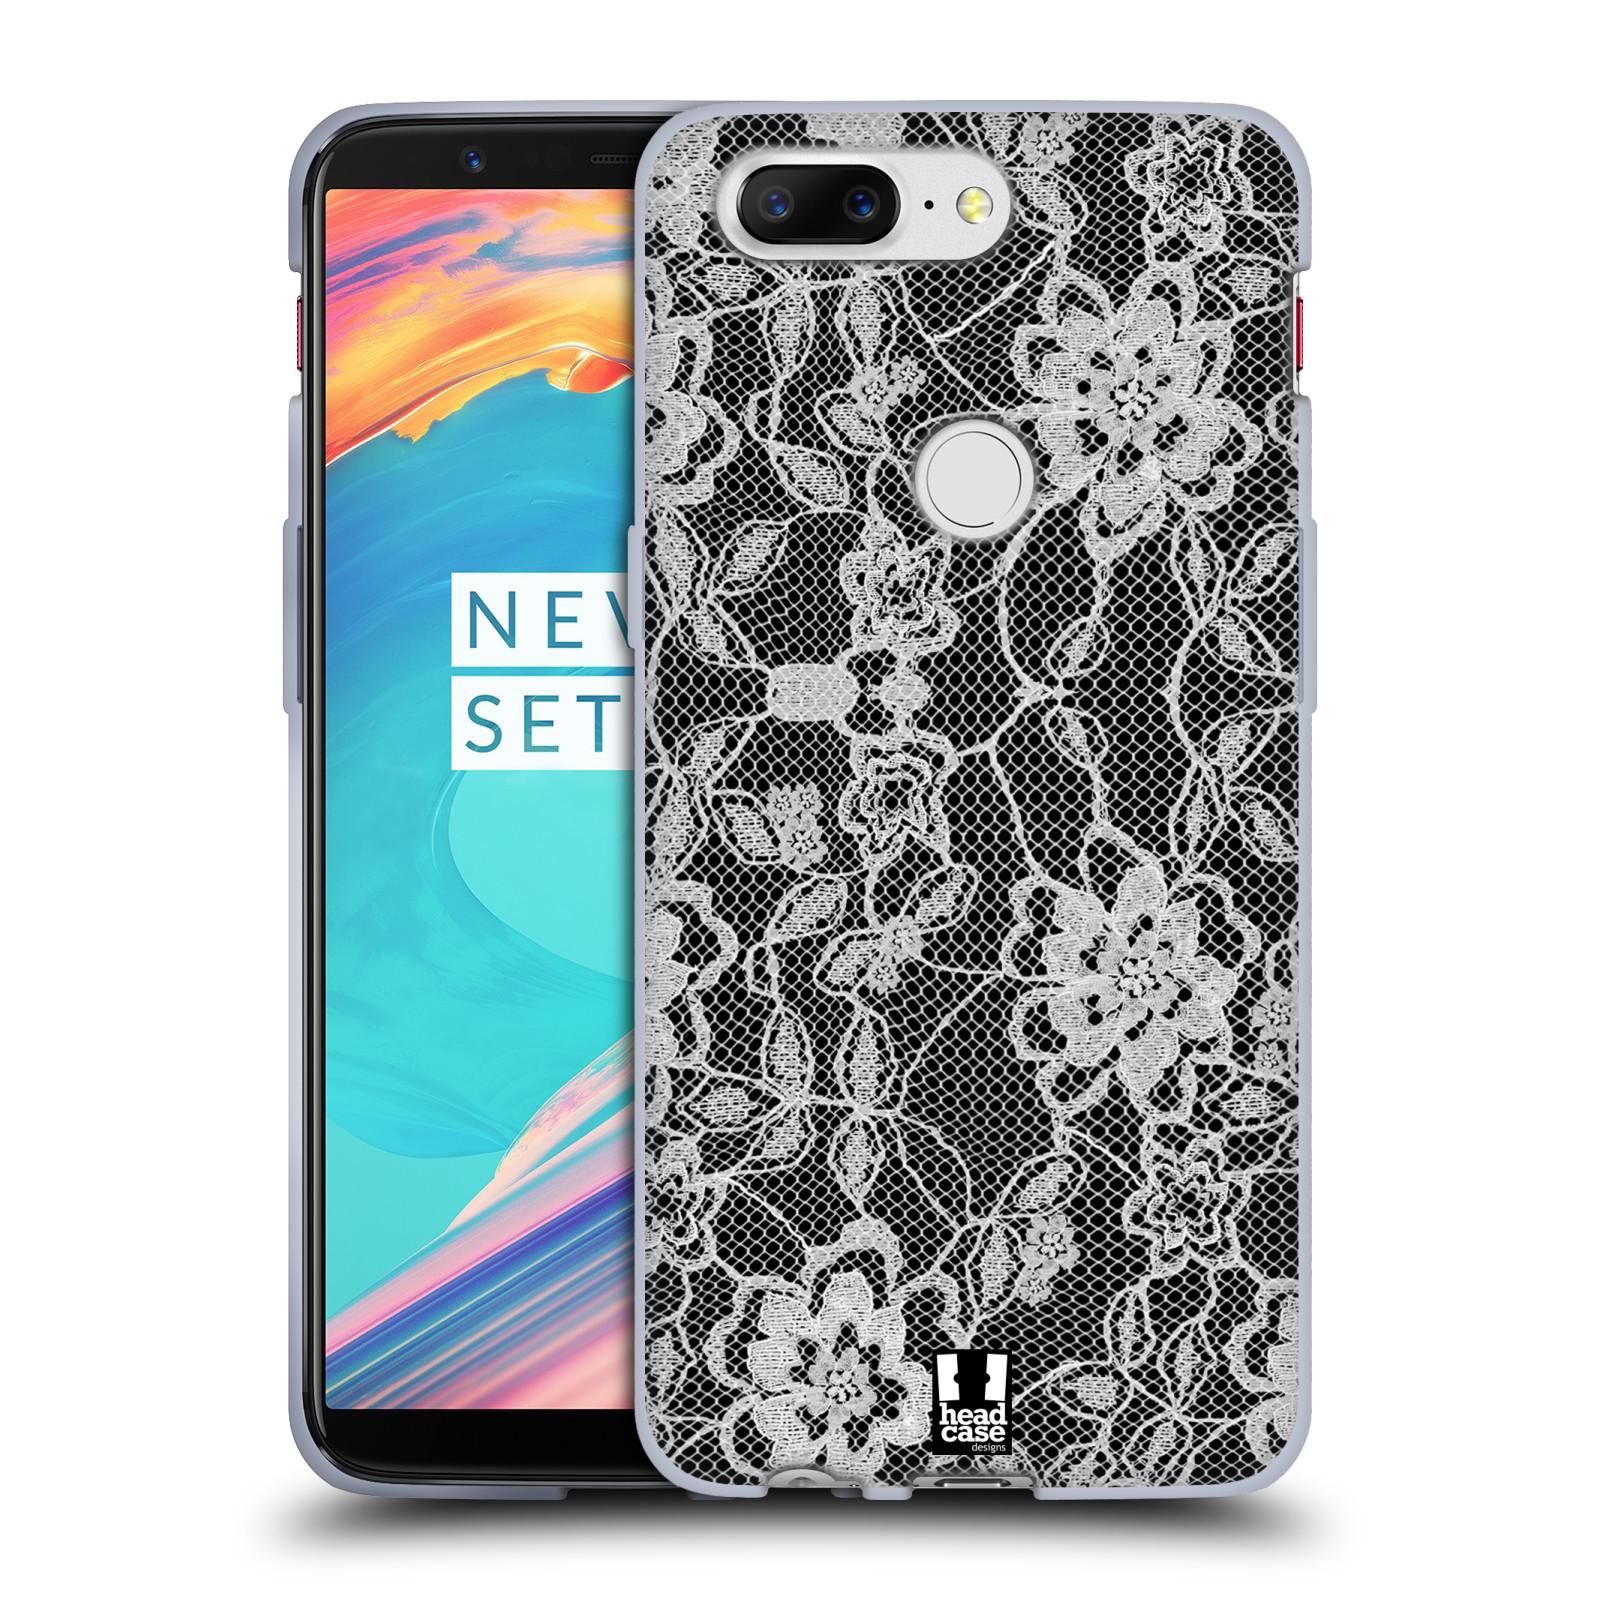 Silikonové pouzdro na mobil OnePlus 5T - Head Case - FLOWERY KRAJKA